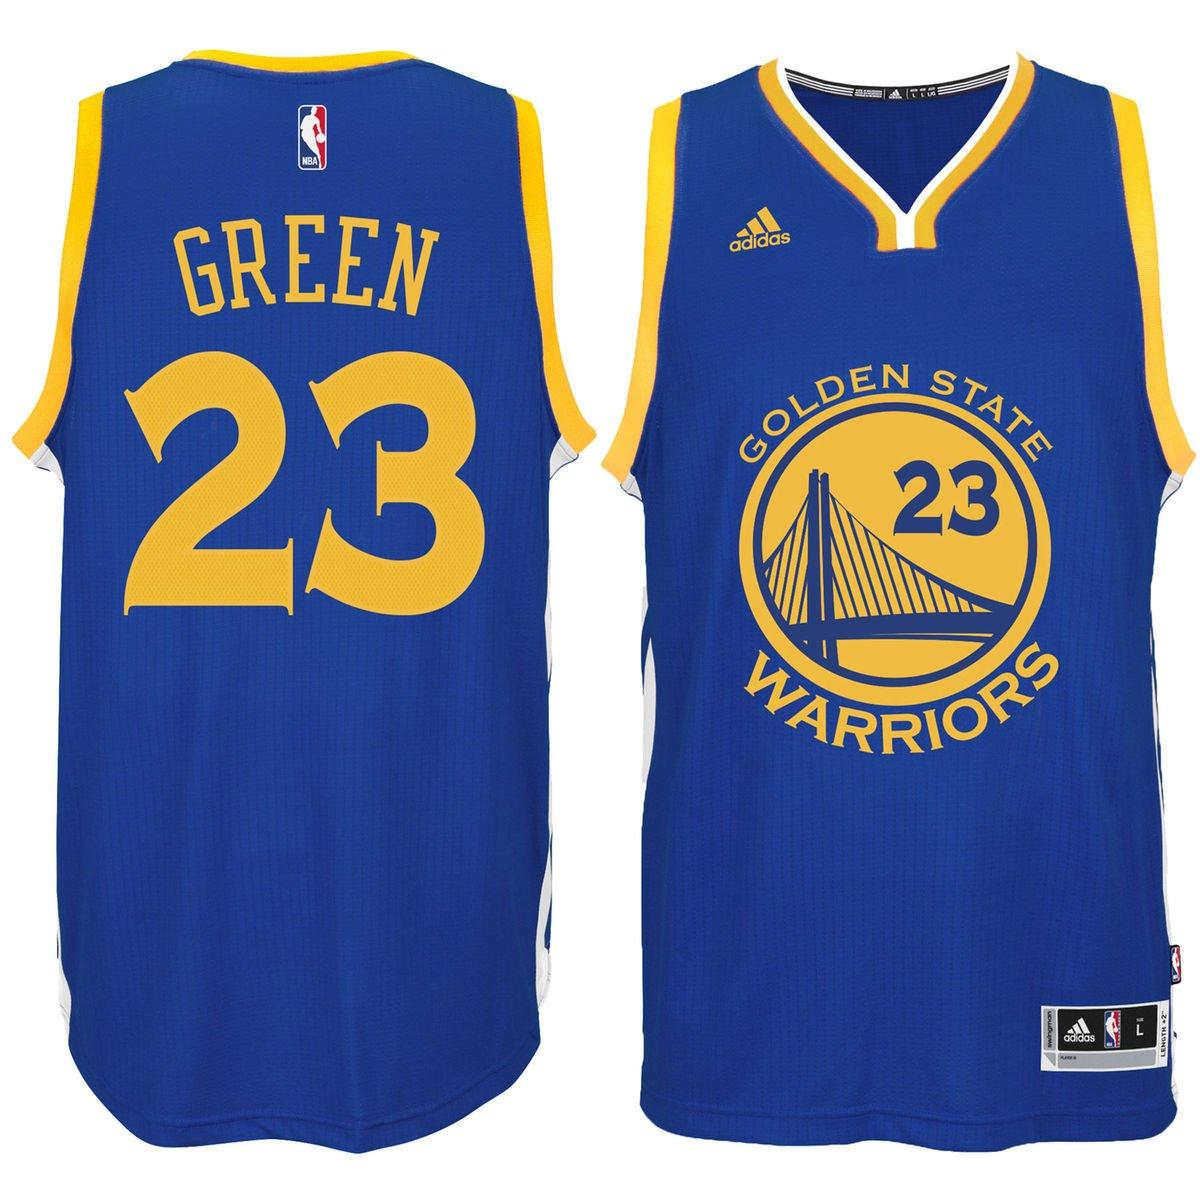 separation shoes 3ff55 04e69 Amazon.com: Draymond Green Golden State Warriors Blue NBA ...